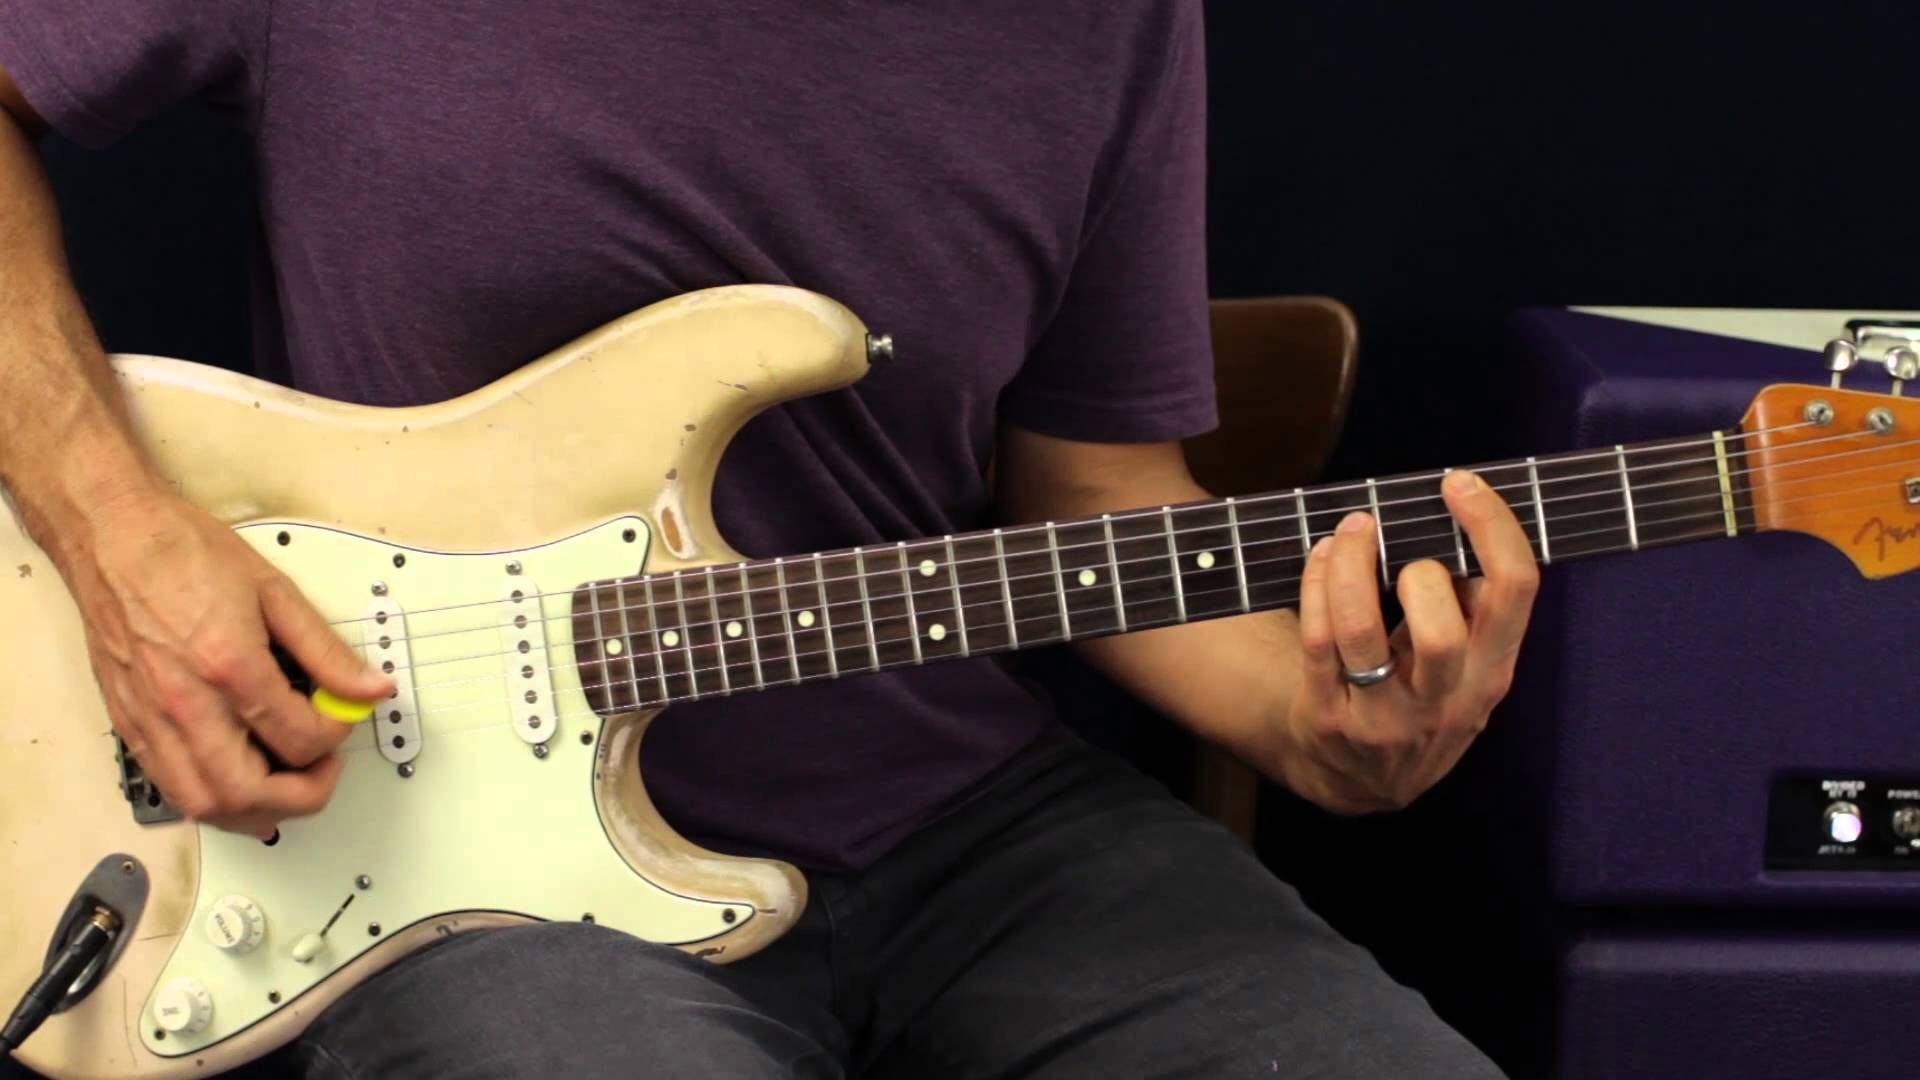 Drop d tuning how to write hard rock songs guitar